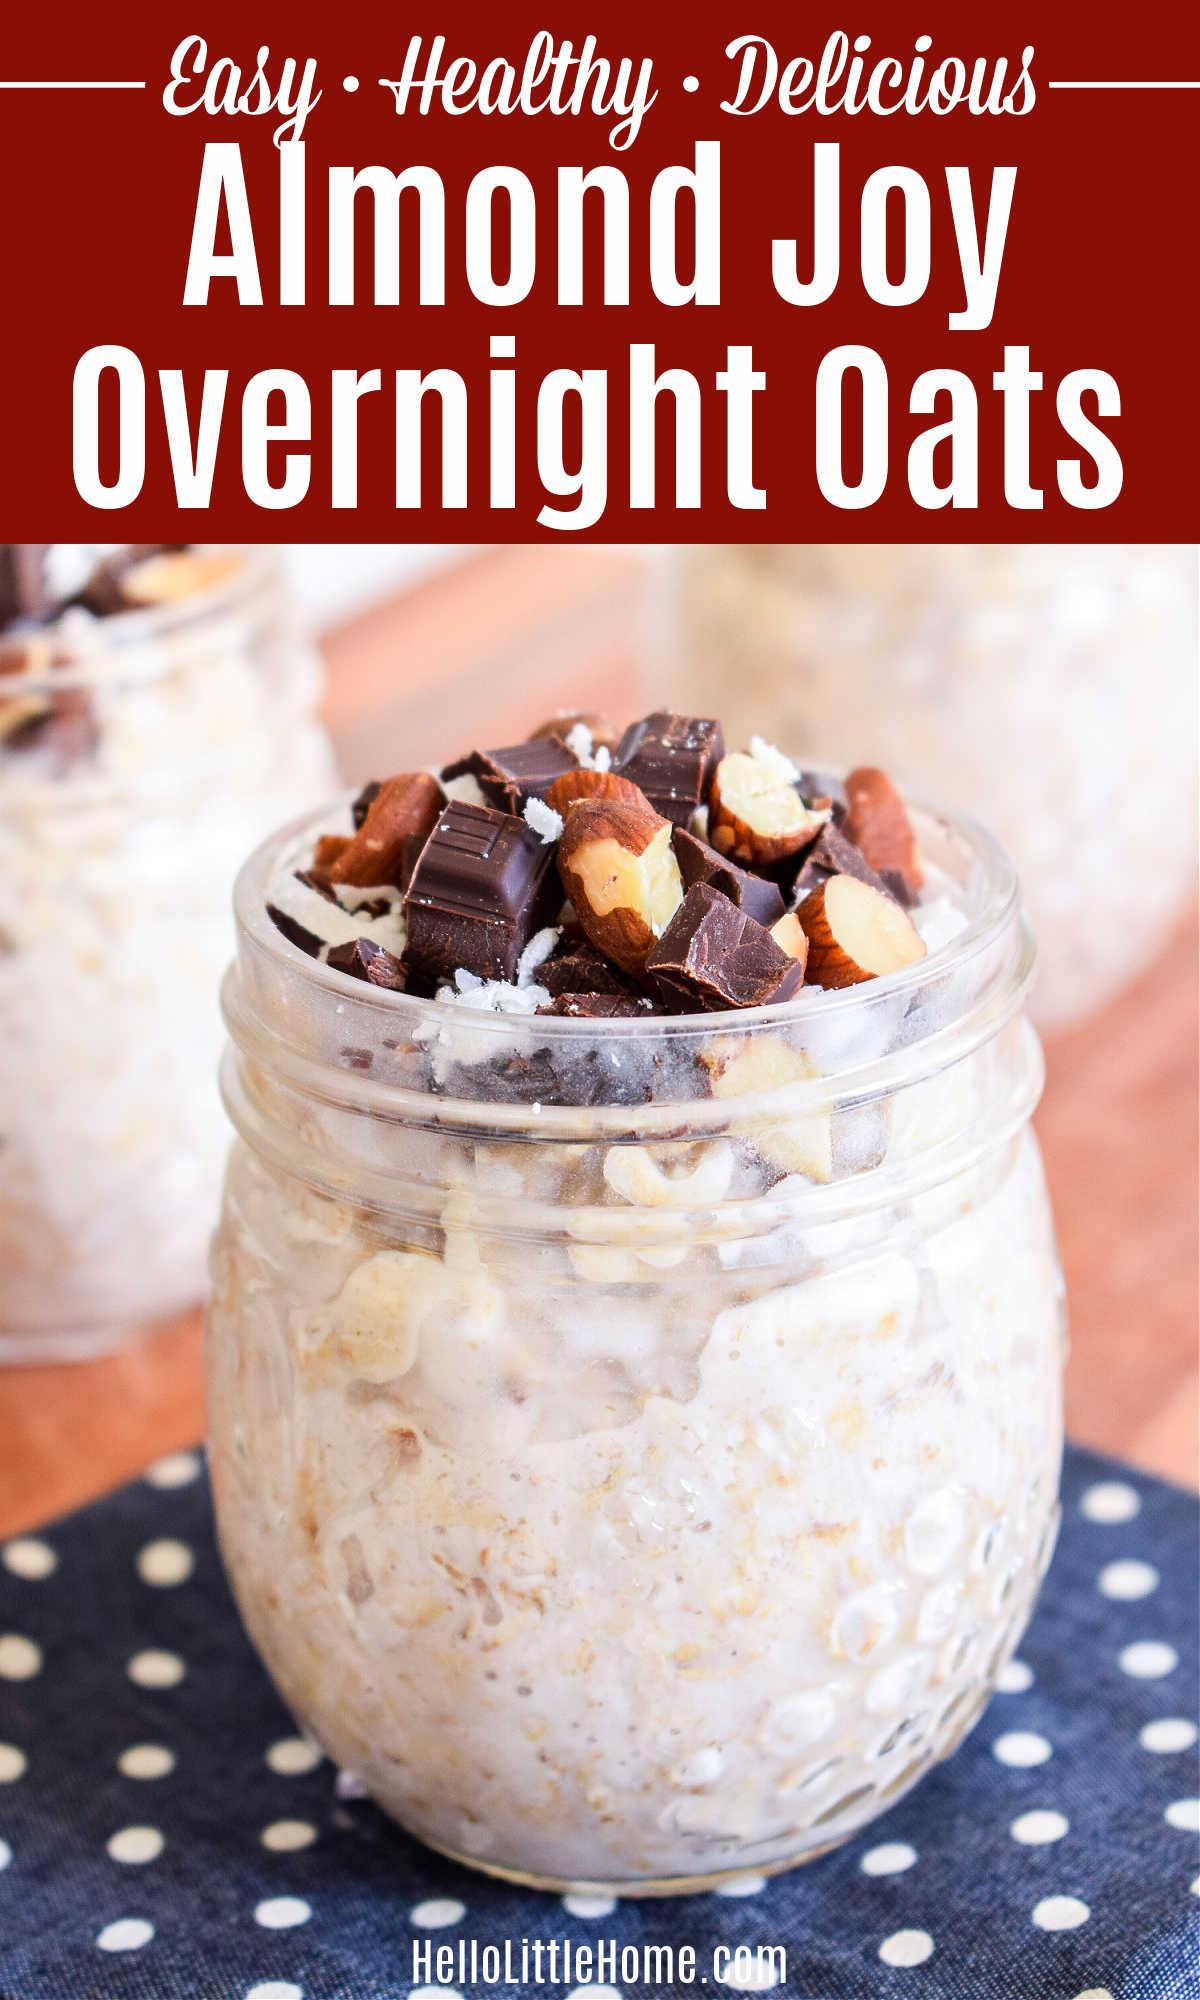 A closeup of the Almond Joy Overnight Oats in a mason jar on a polka dot napkin.